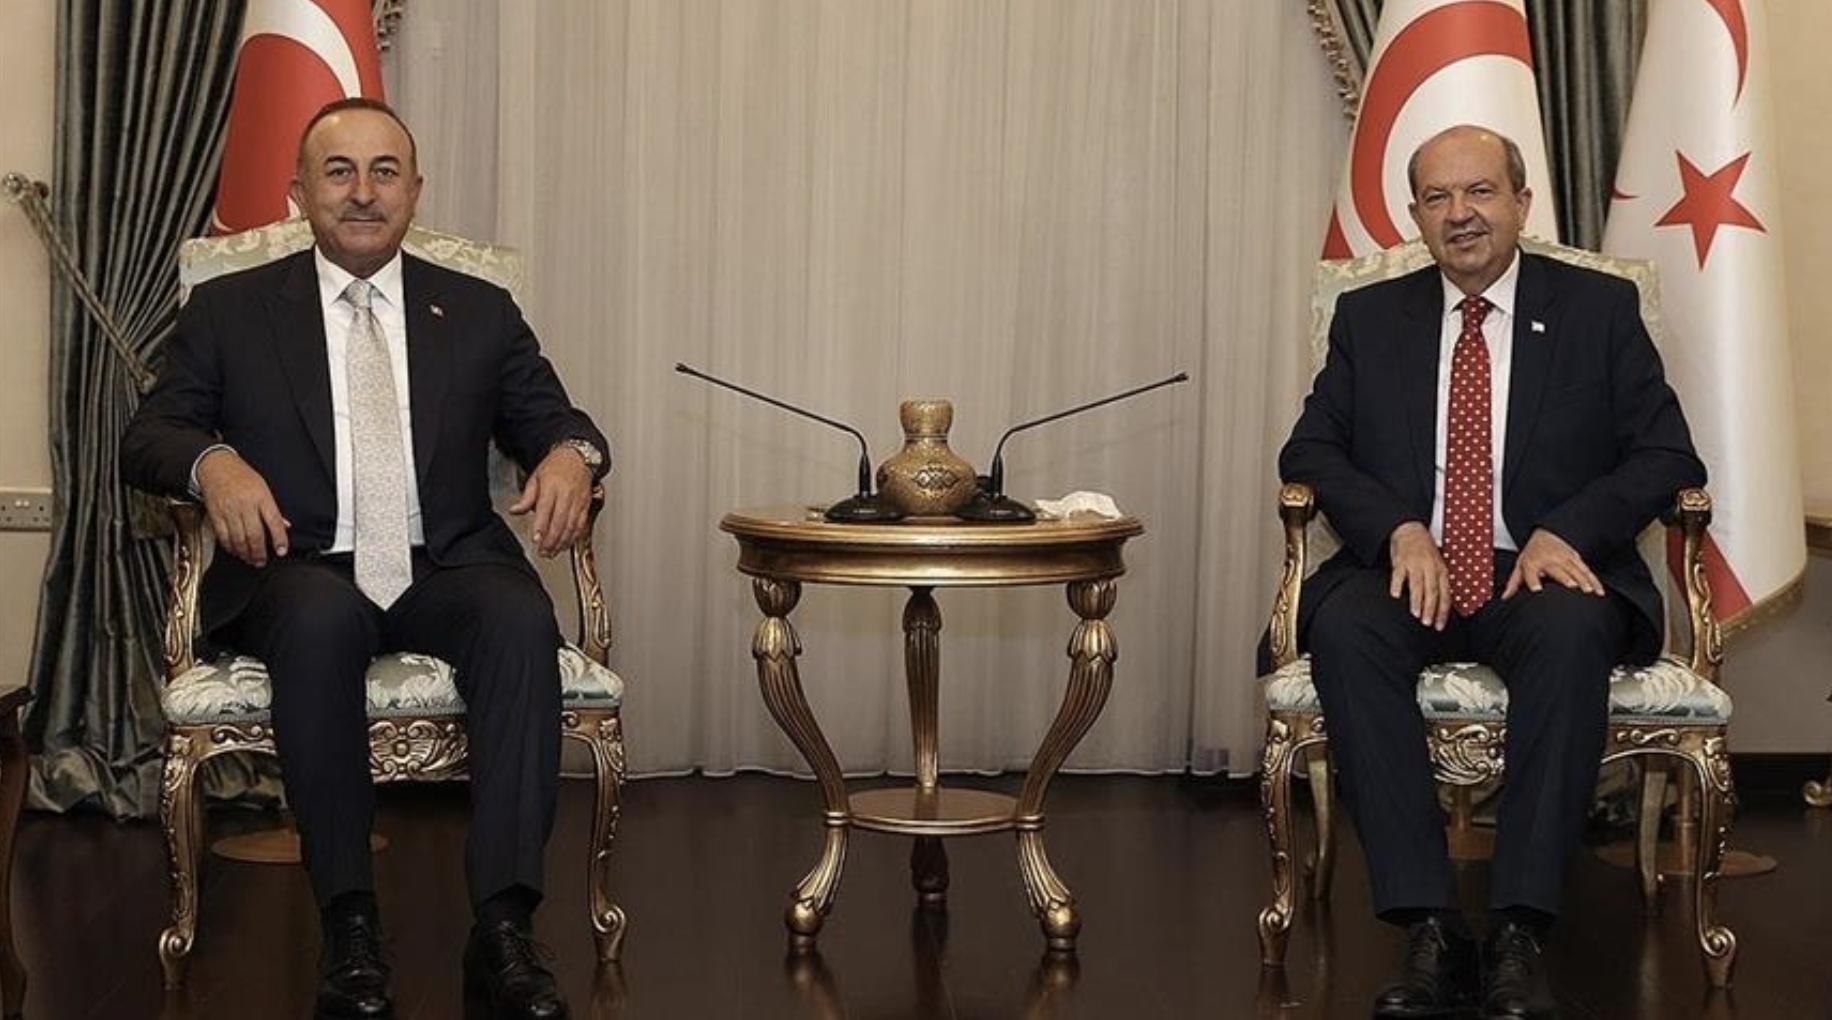 Cavusoglu: «Άσκοπο να διοριστεί προς το παρόν ειδικός εκπρόσωπος του ΟΗΕ στην Κύπρο»